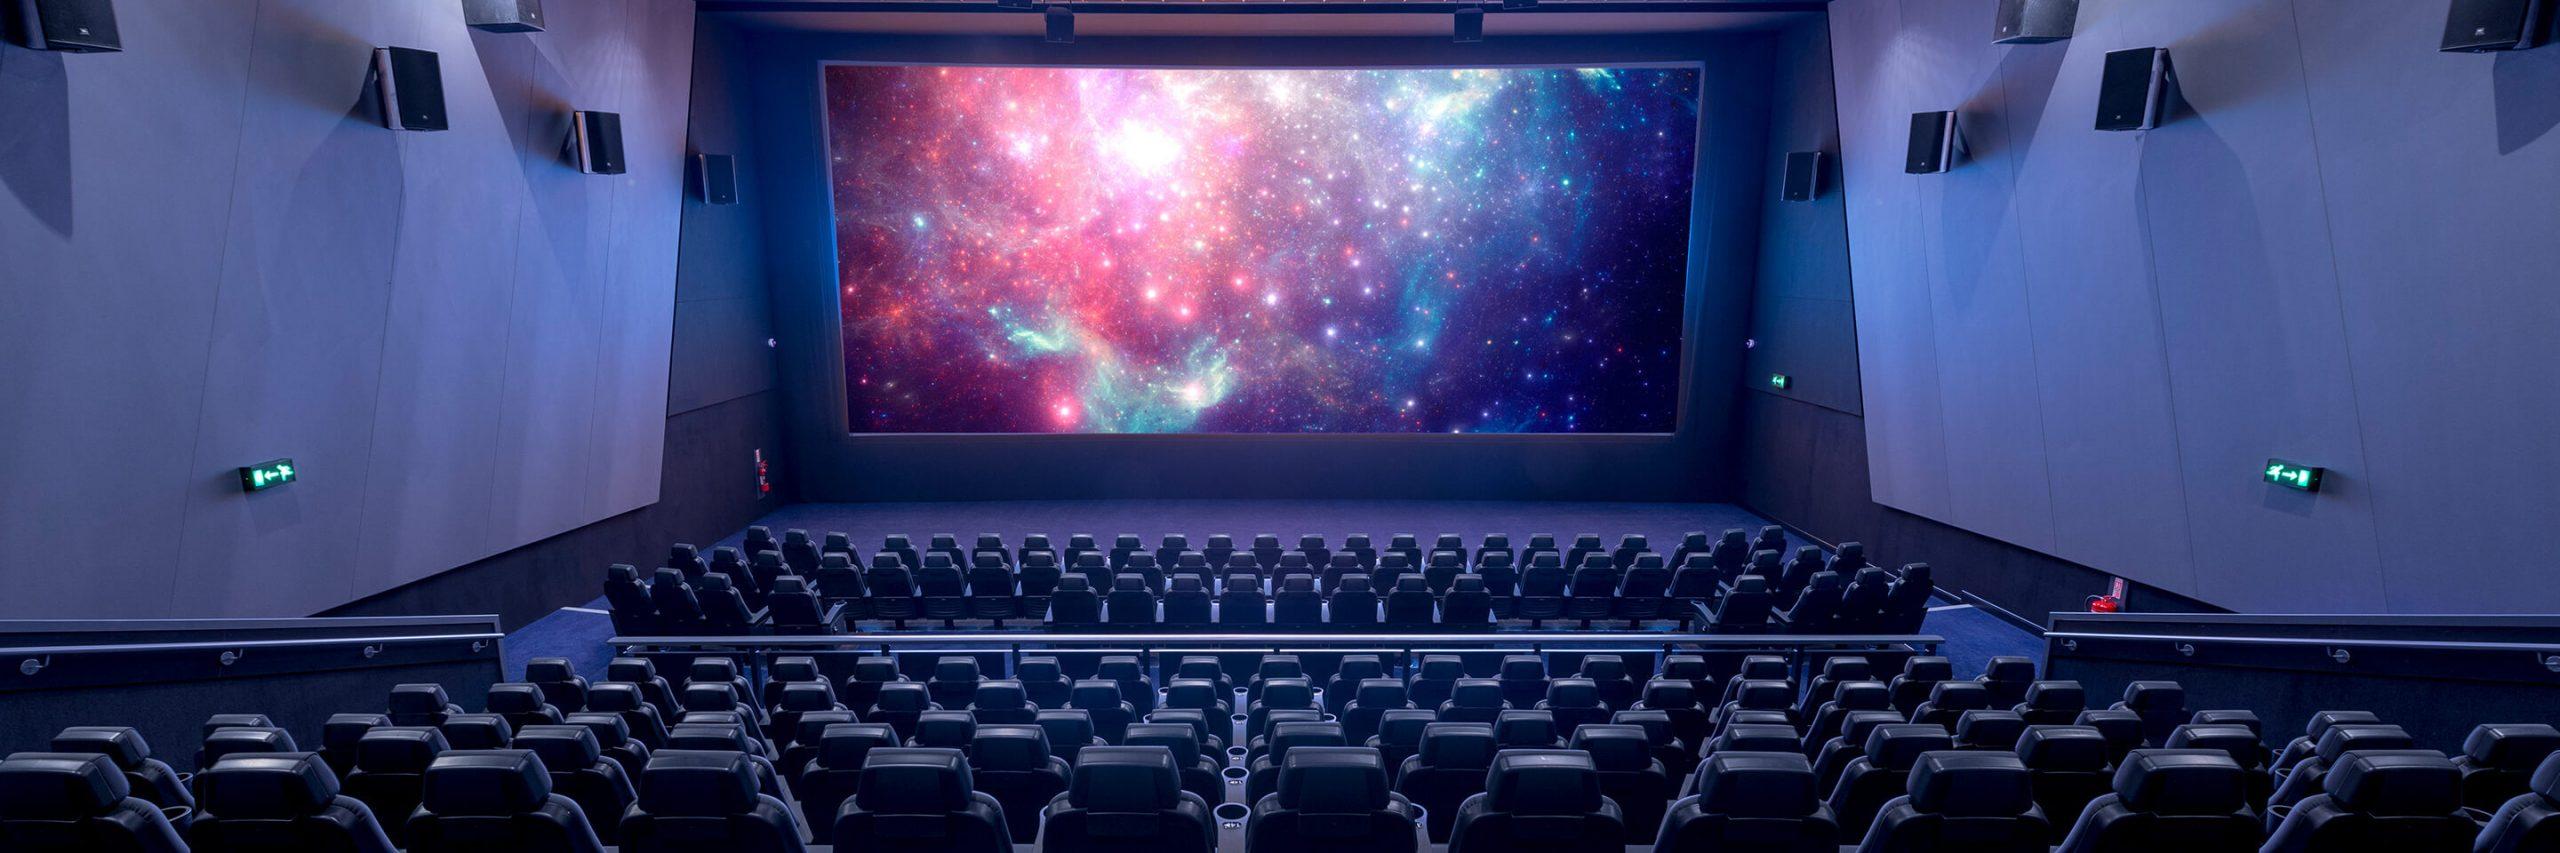 Odeon cinema - screening for upcoming films